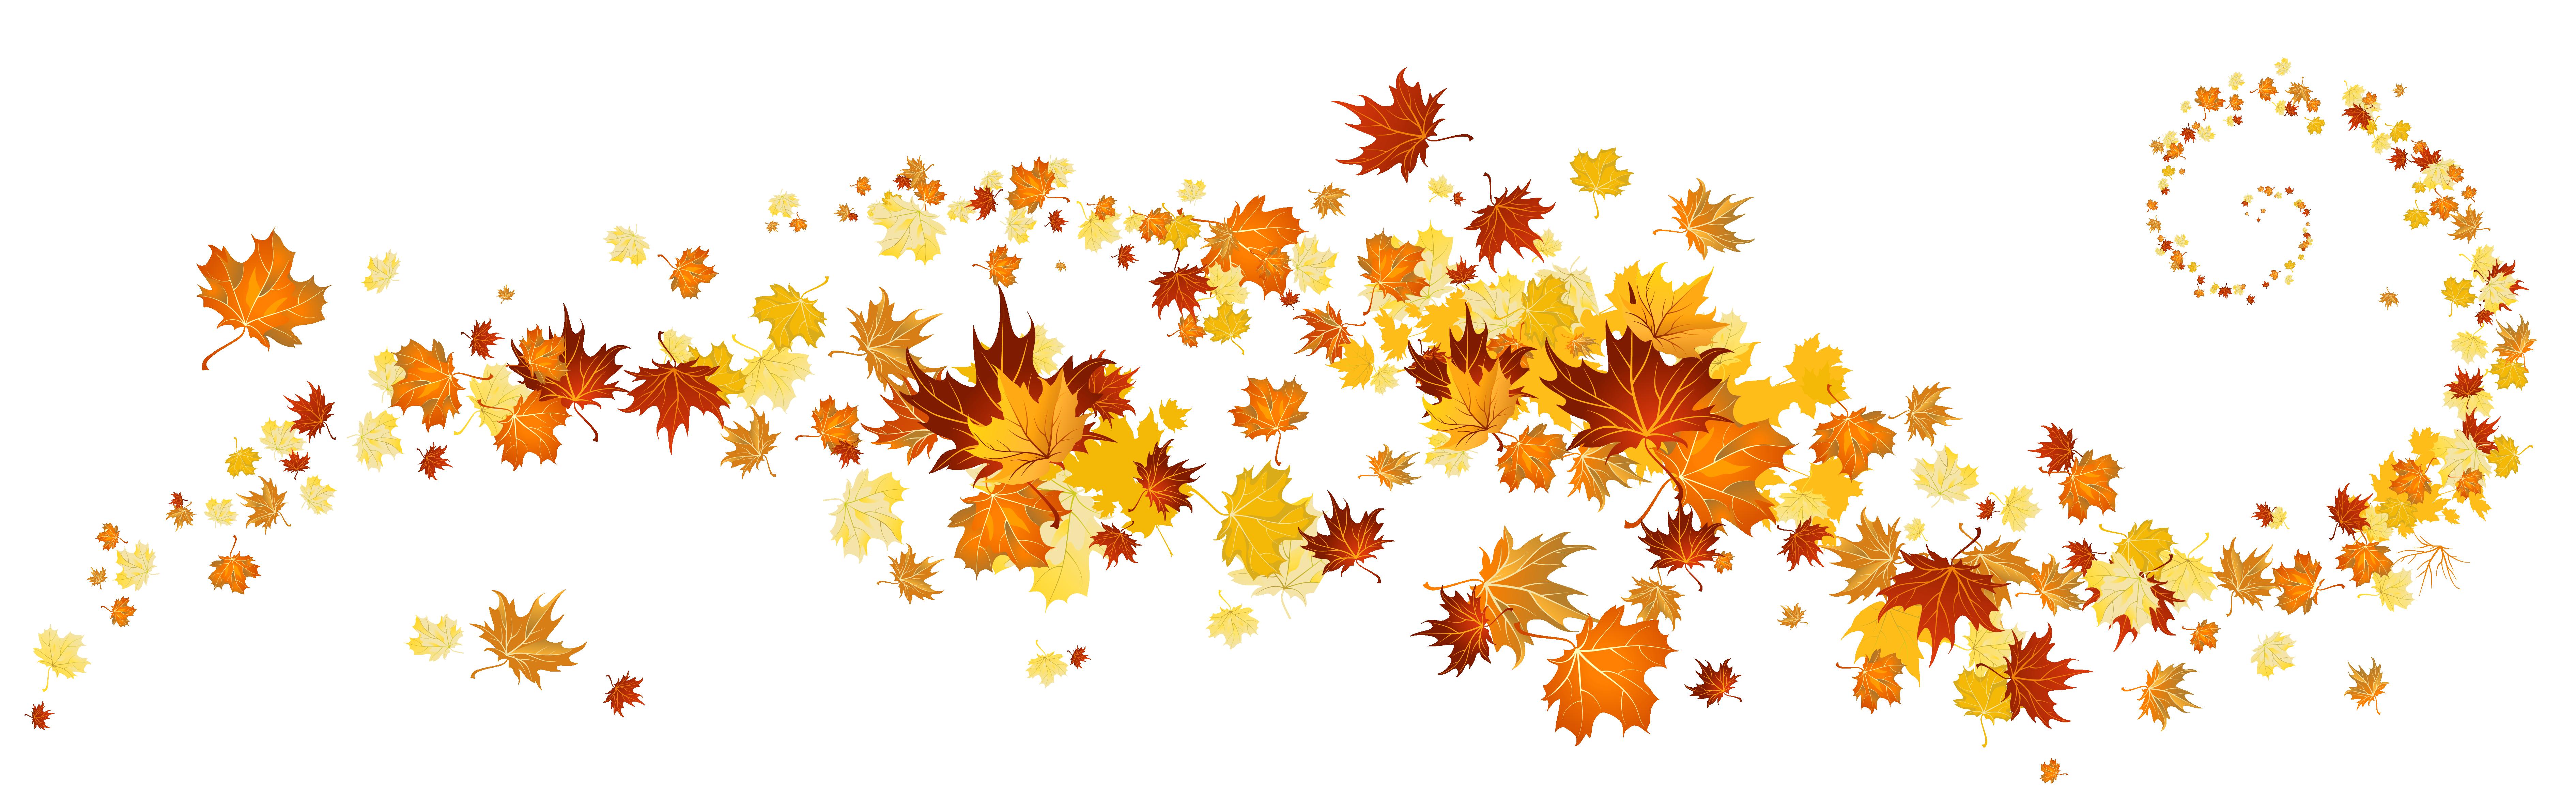 leaves fall leaf clip art .-leaves fall leaf clip art .-13